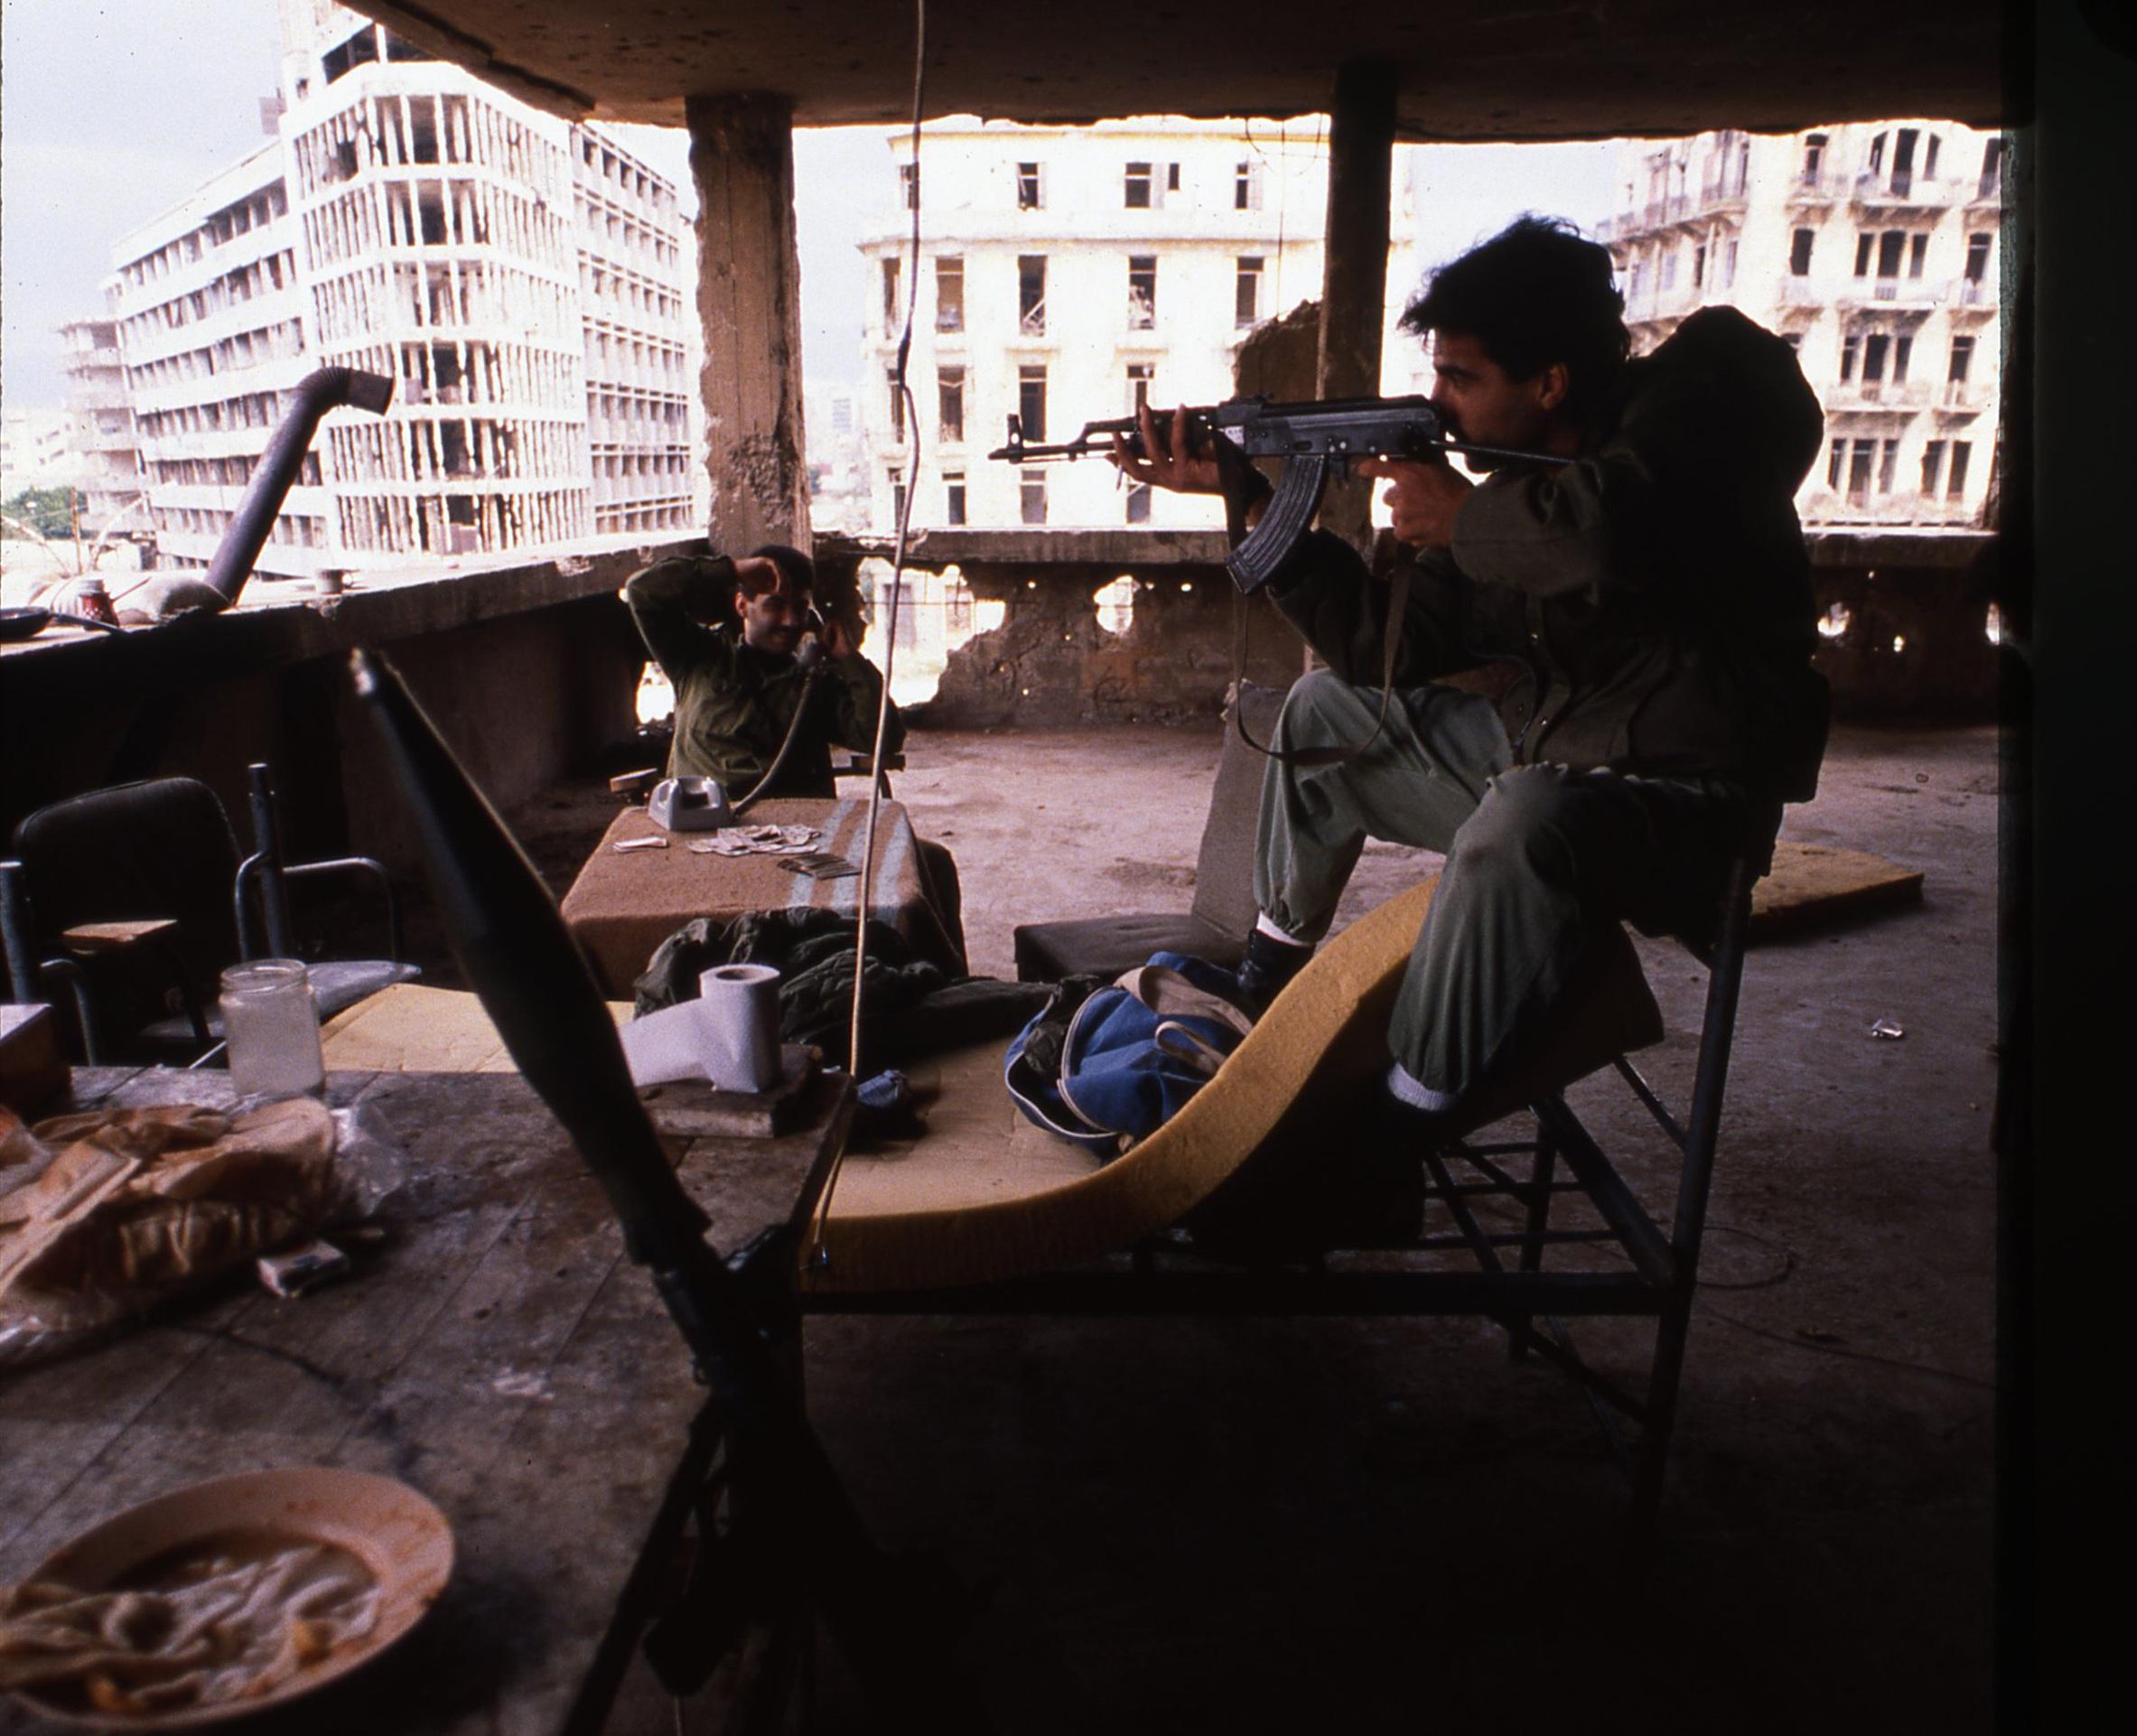 lebanon militia copy.jpg